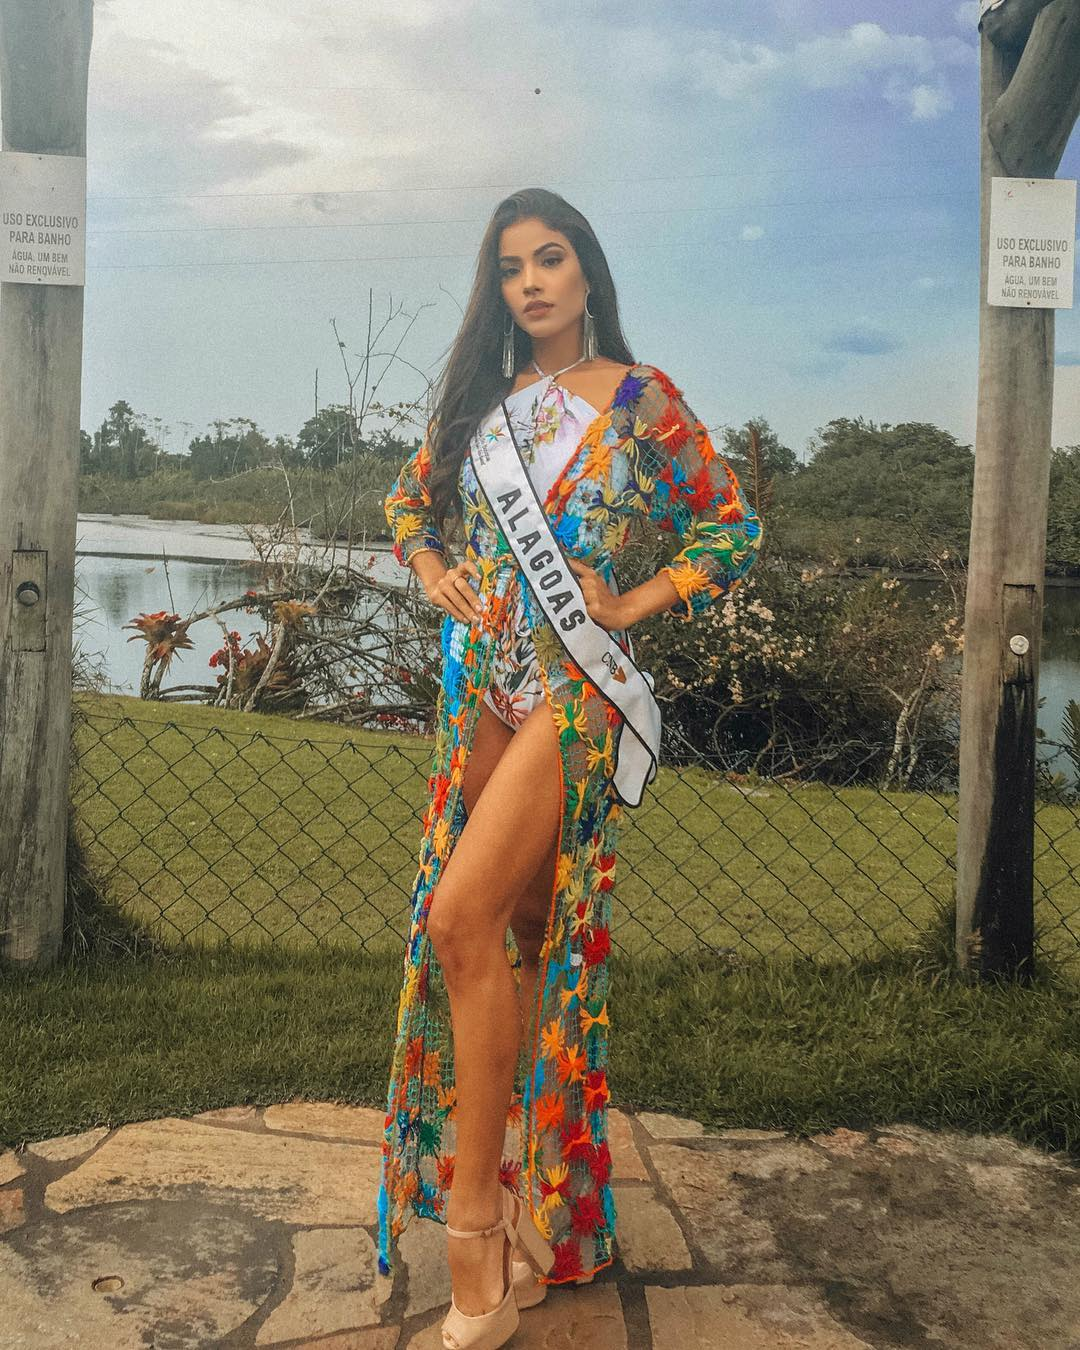 ruth raphaela, miss grand alagoas 2020/miss alagoas mundo 2018. - Página 2 38644610